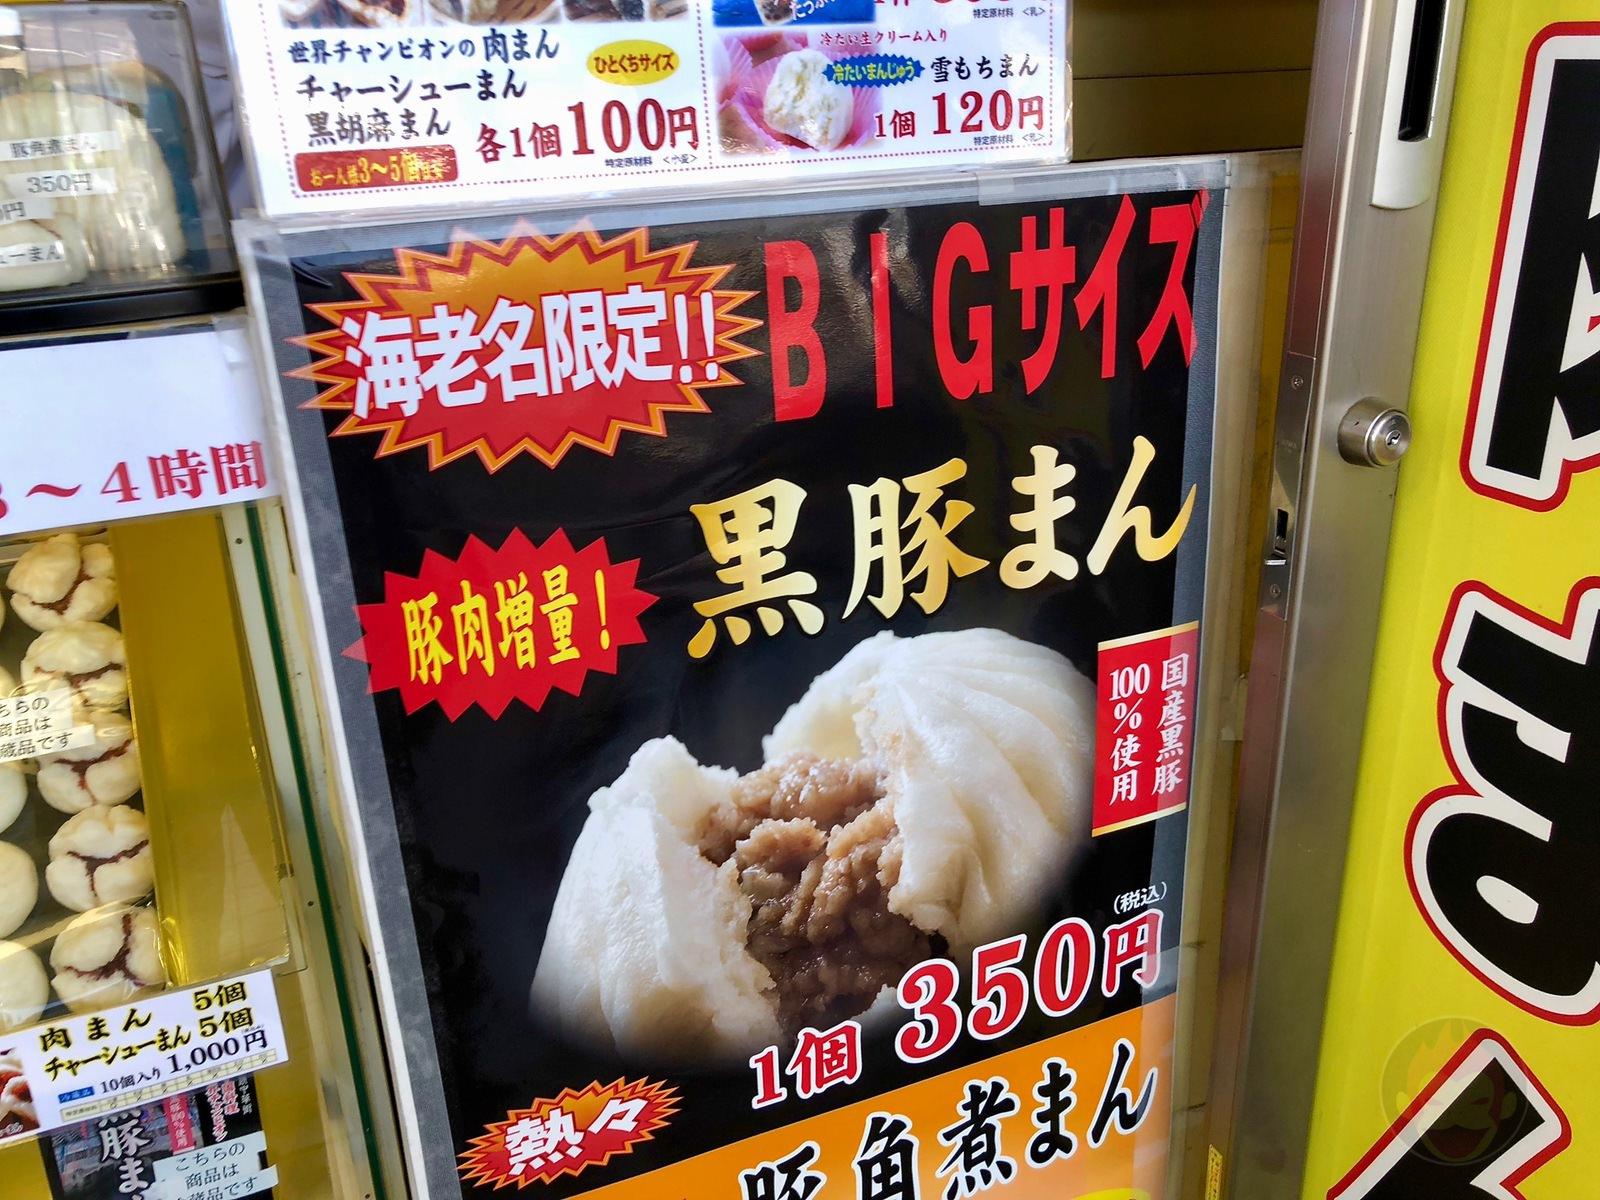 Kocho-Giant-Nikuman-Ebina-Service-Area-01.jpg